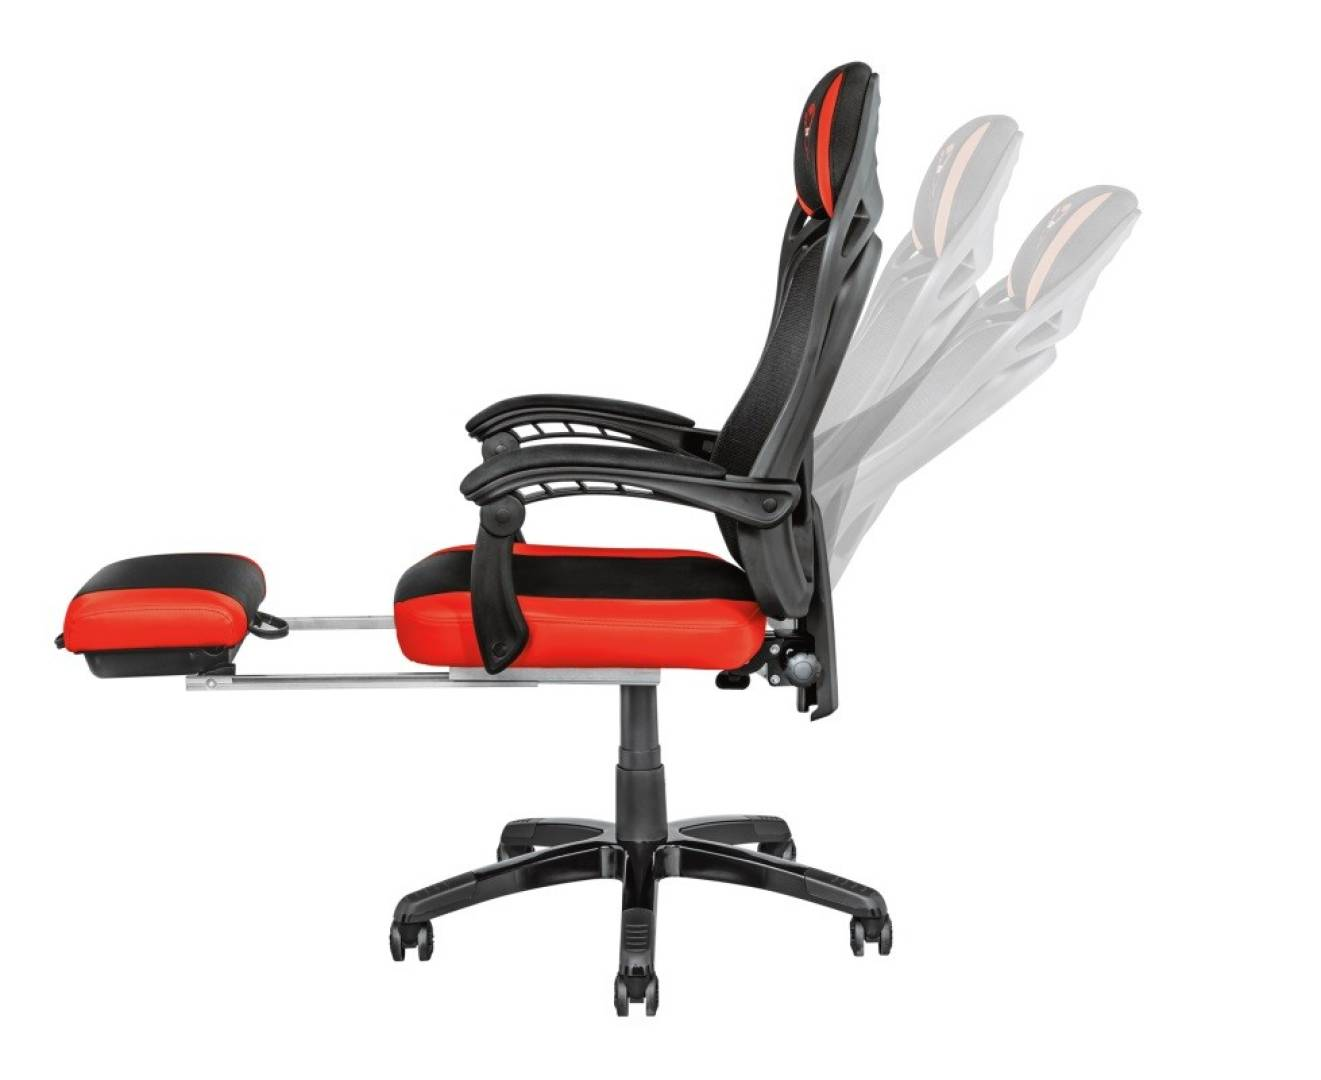 Fotel gamingowy GXT 706 RONA